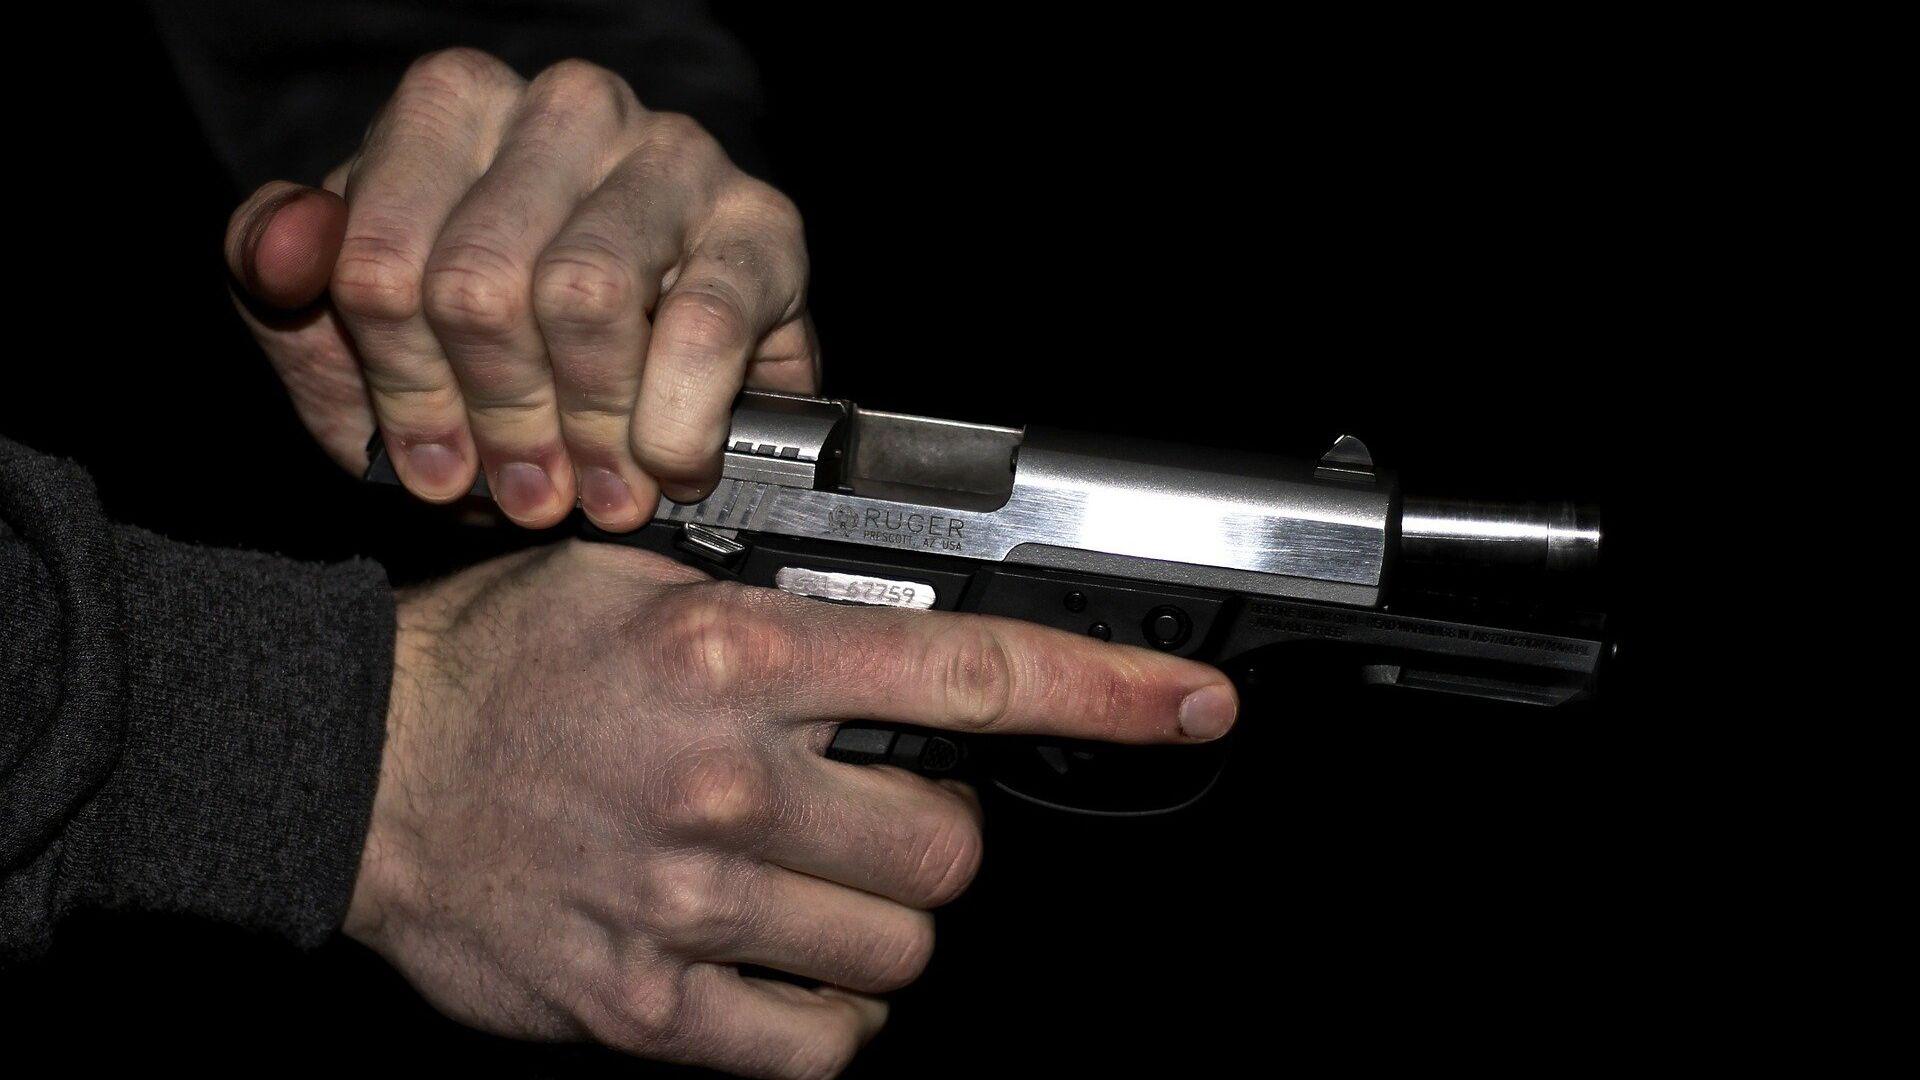 Una pistola (imagen referencial) - Sputnik Mundo, 1920, 21.02.2021